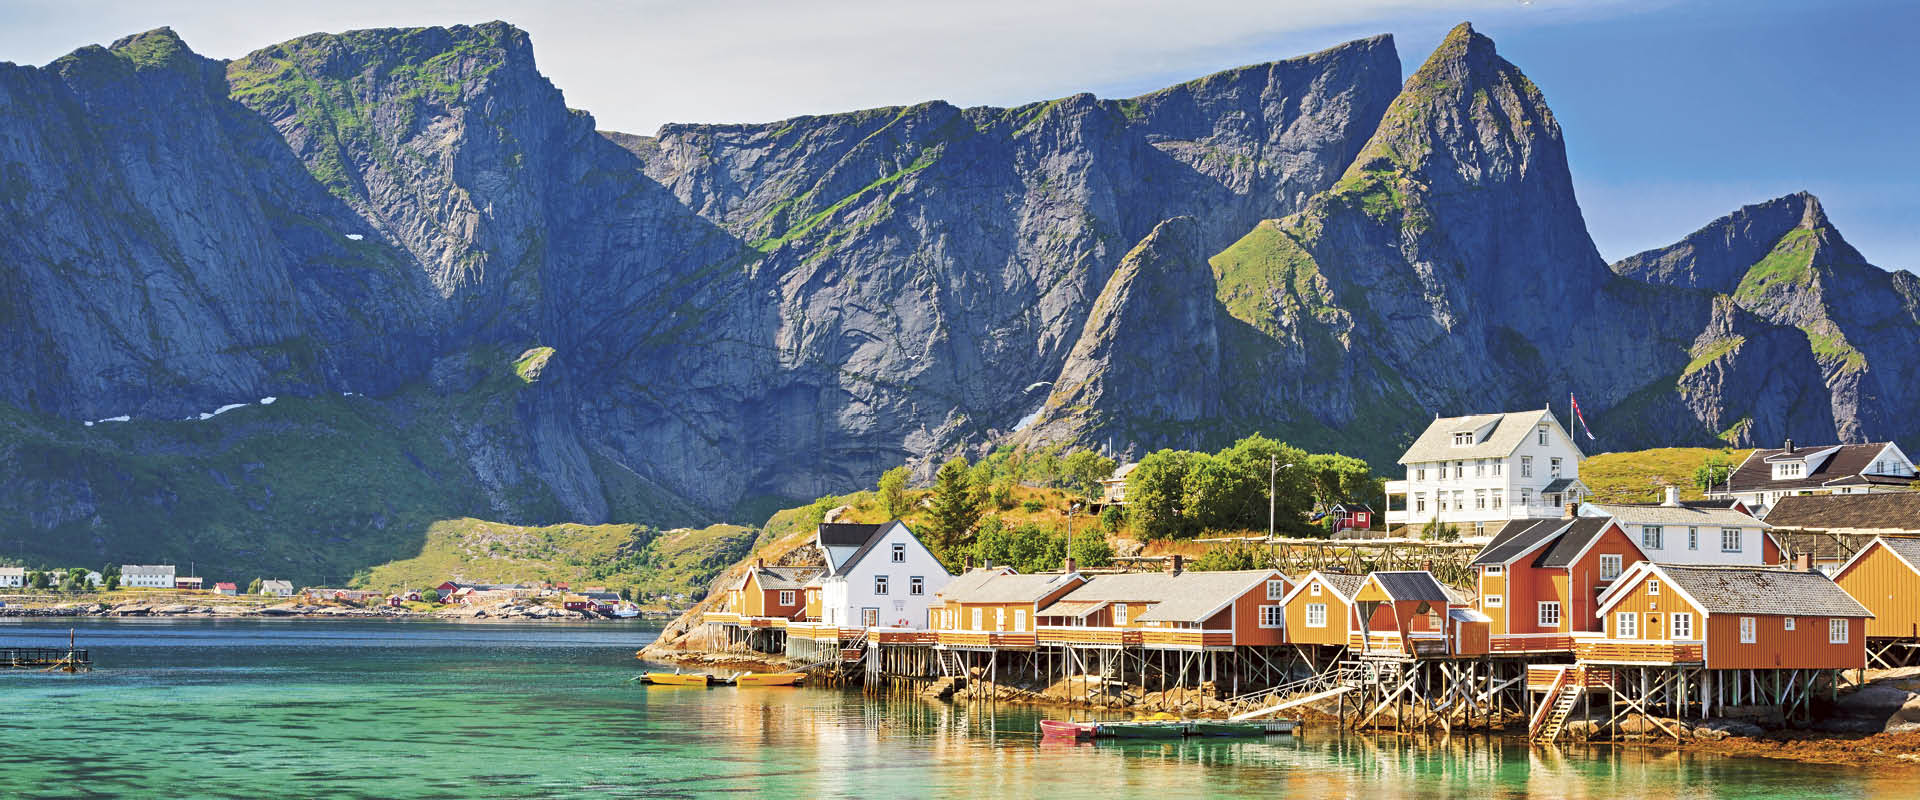 Lofoten Islands & Norwegian Fjords - Scenic Australia